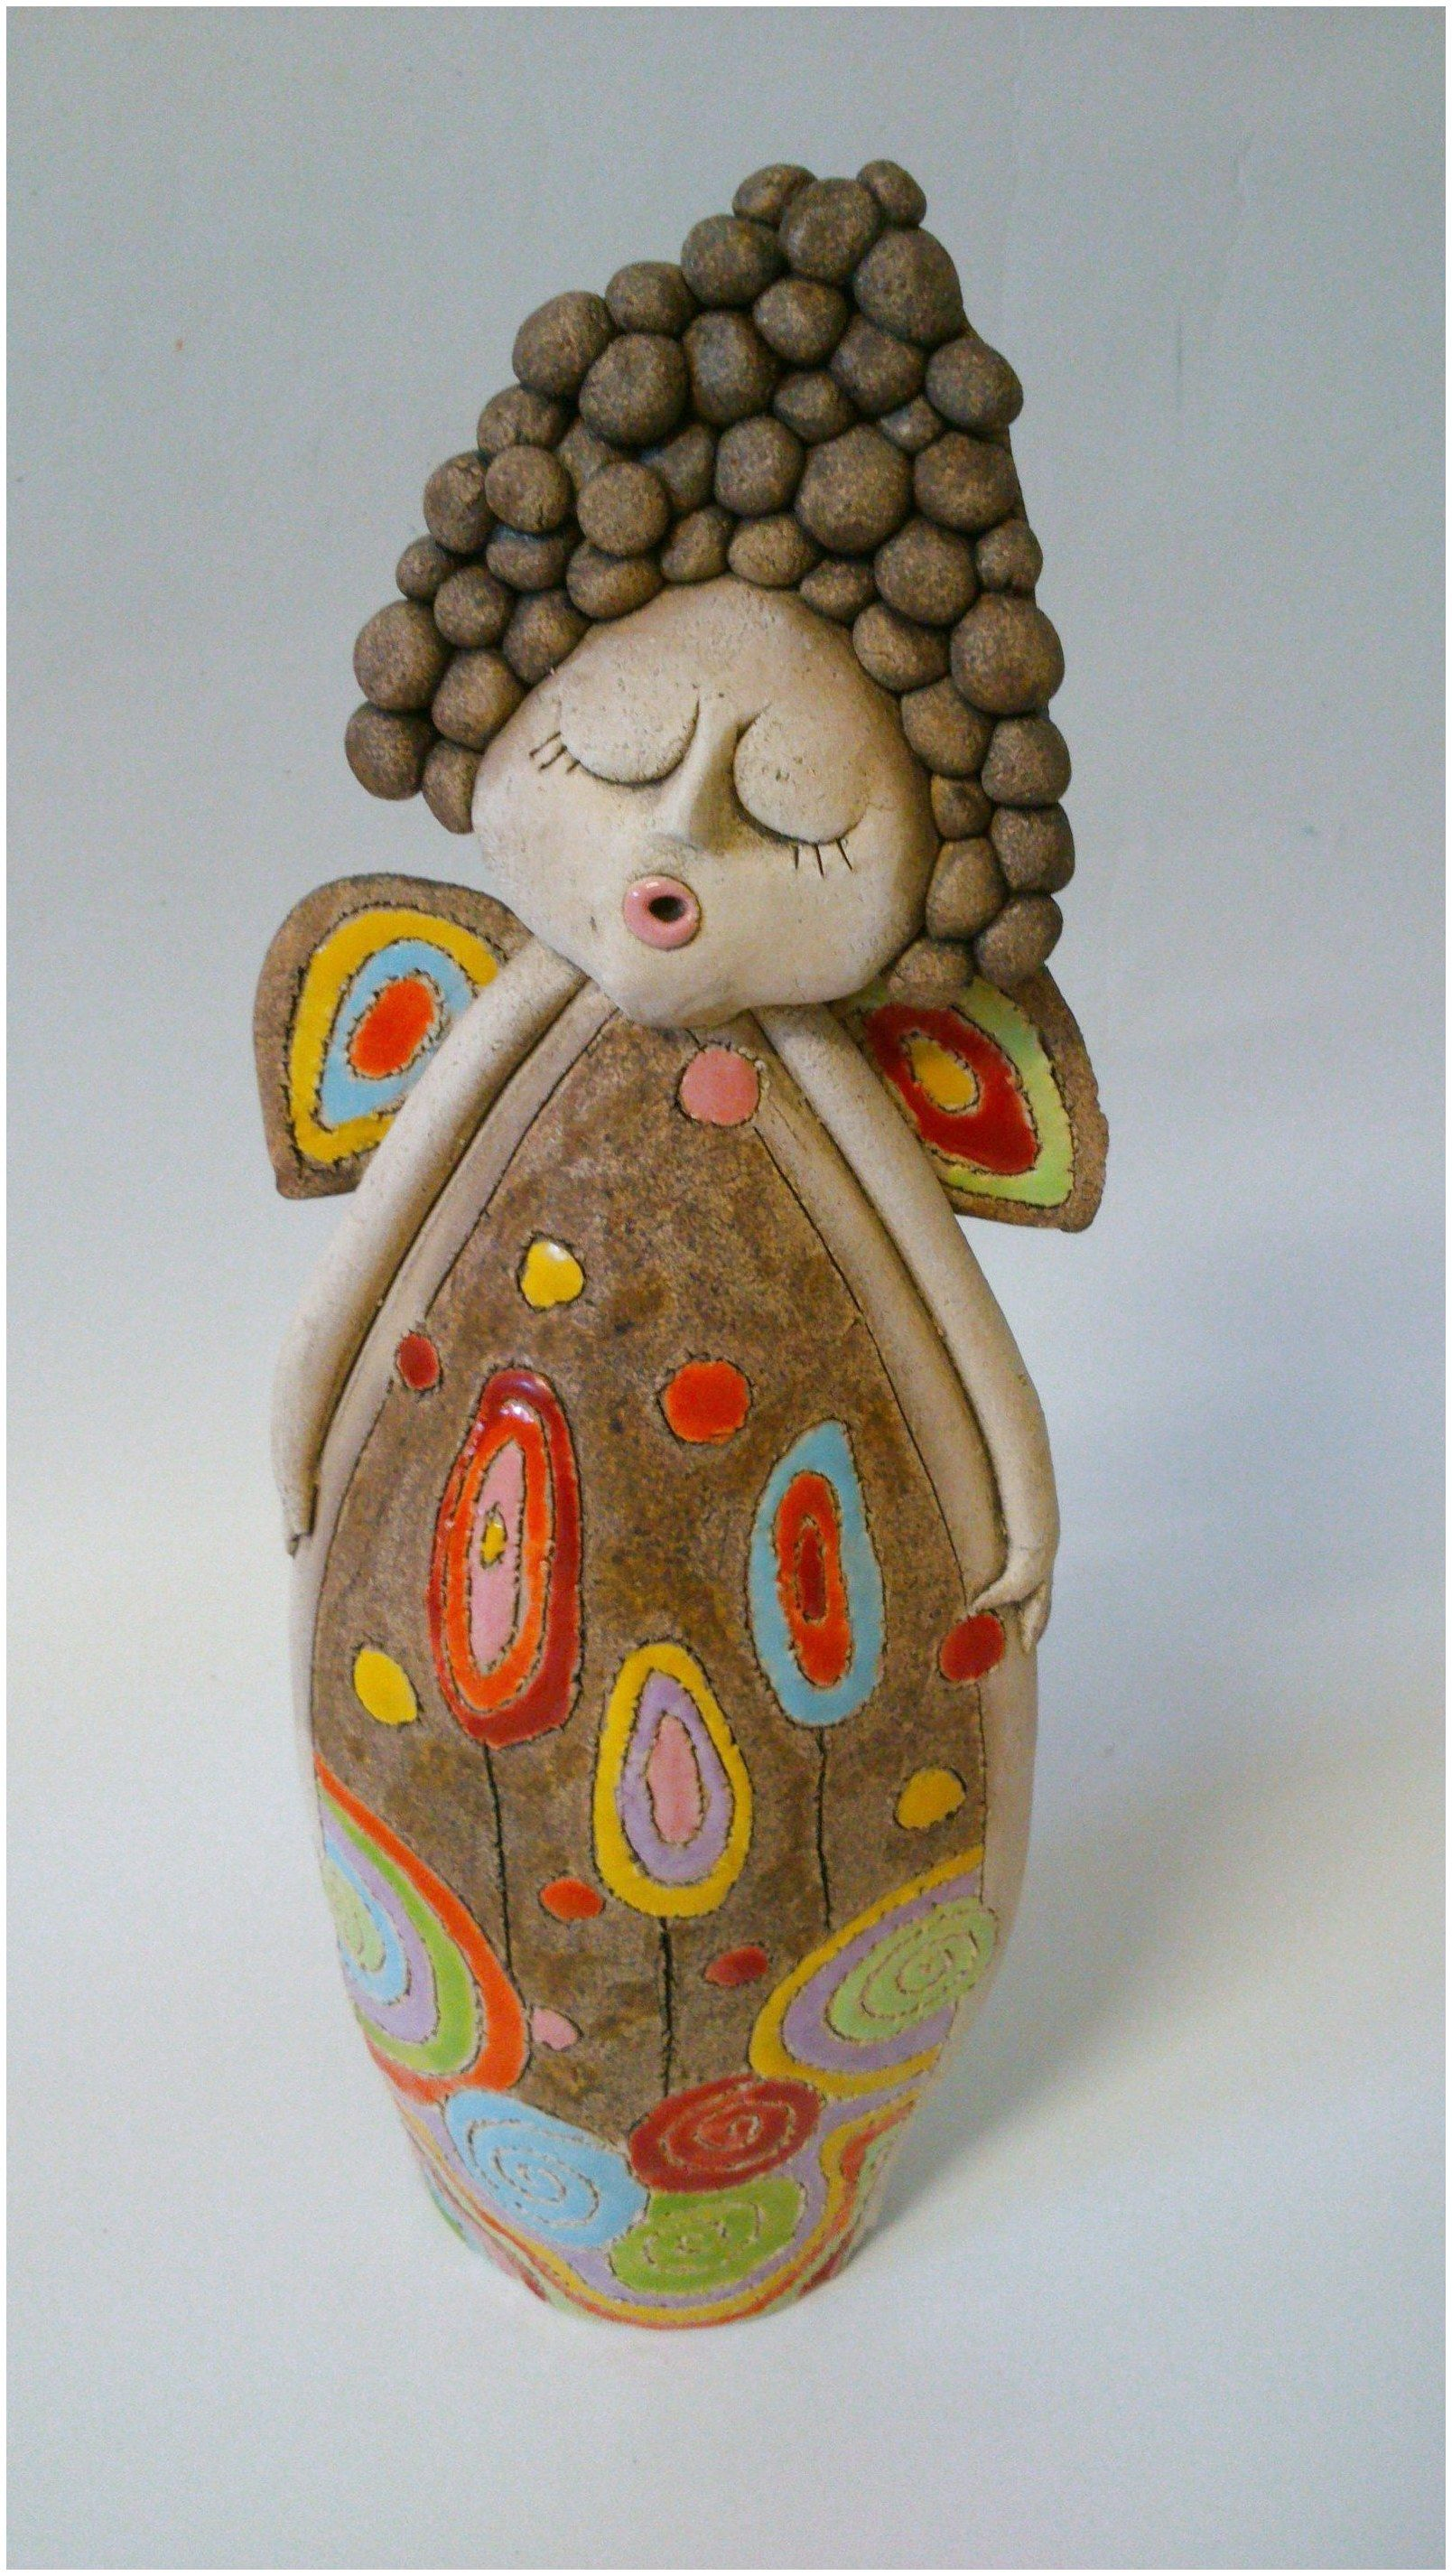 Budget Decorating Using Pottery | Pottery angels, Ceramics ...